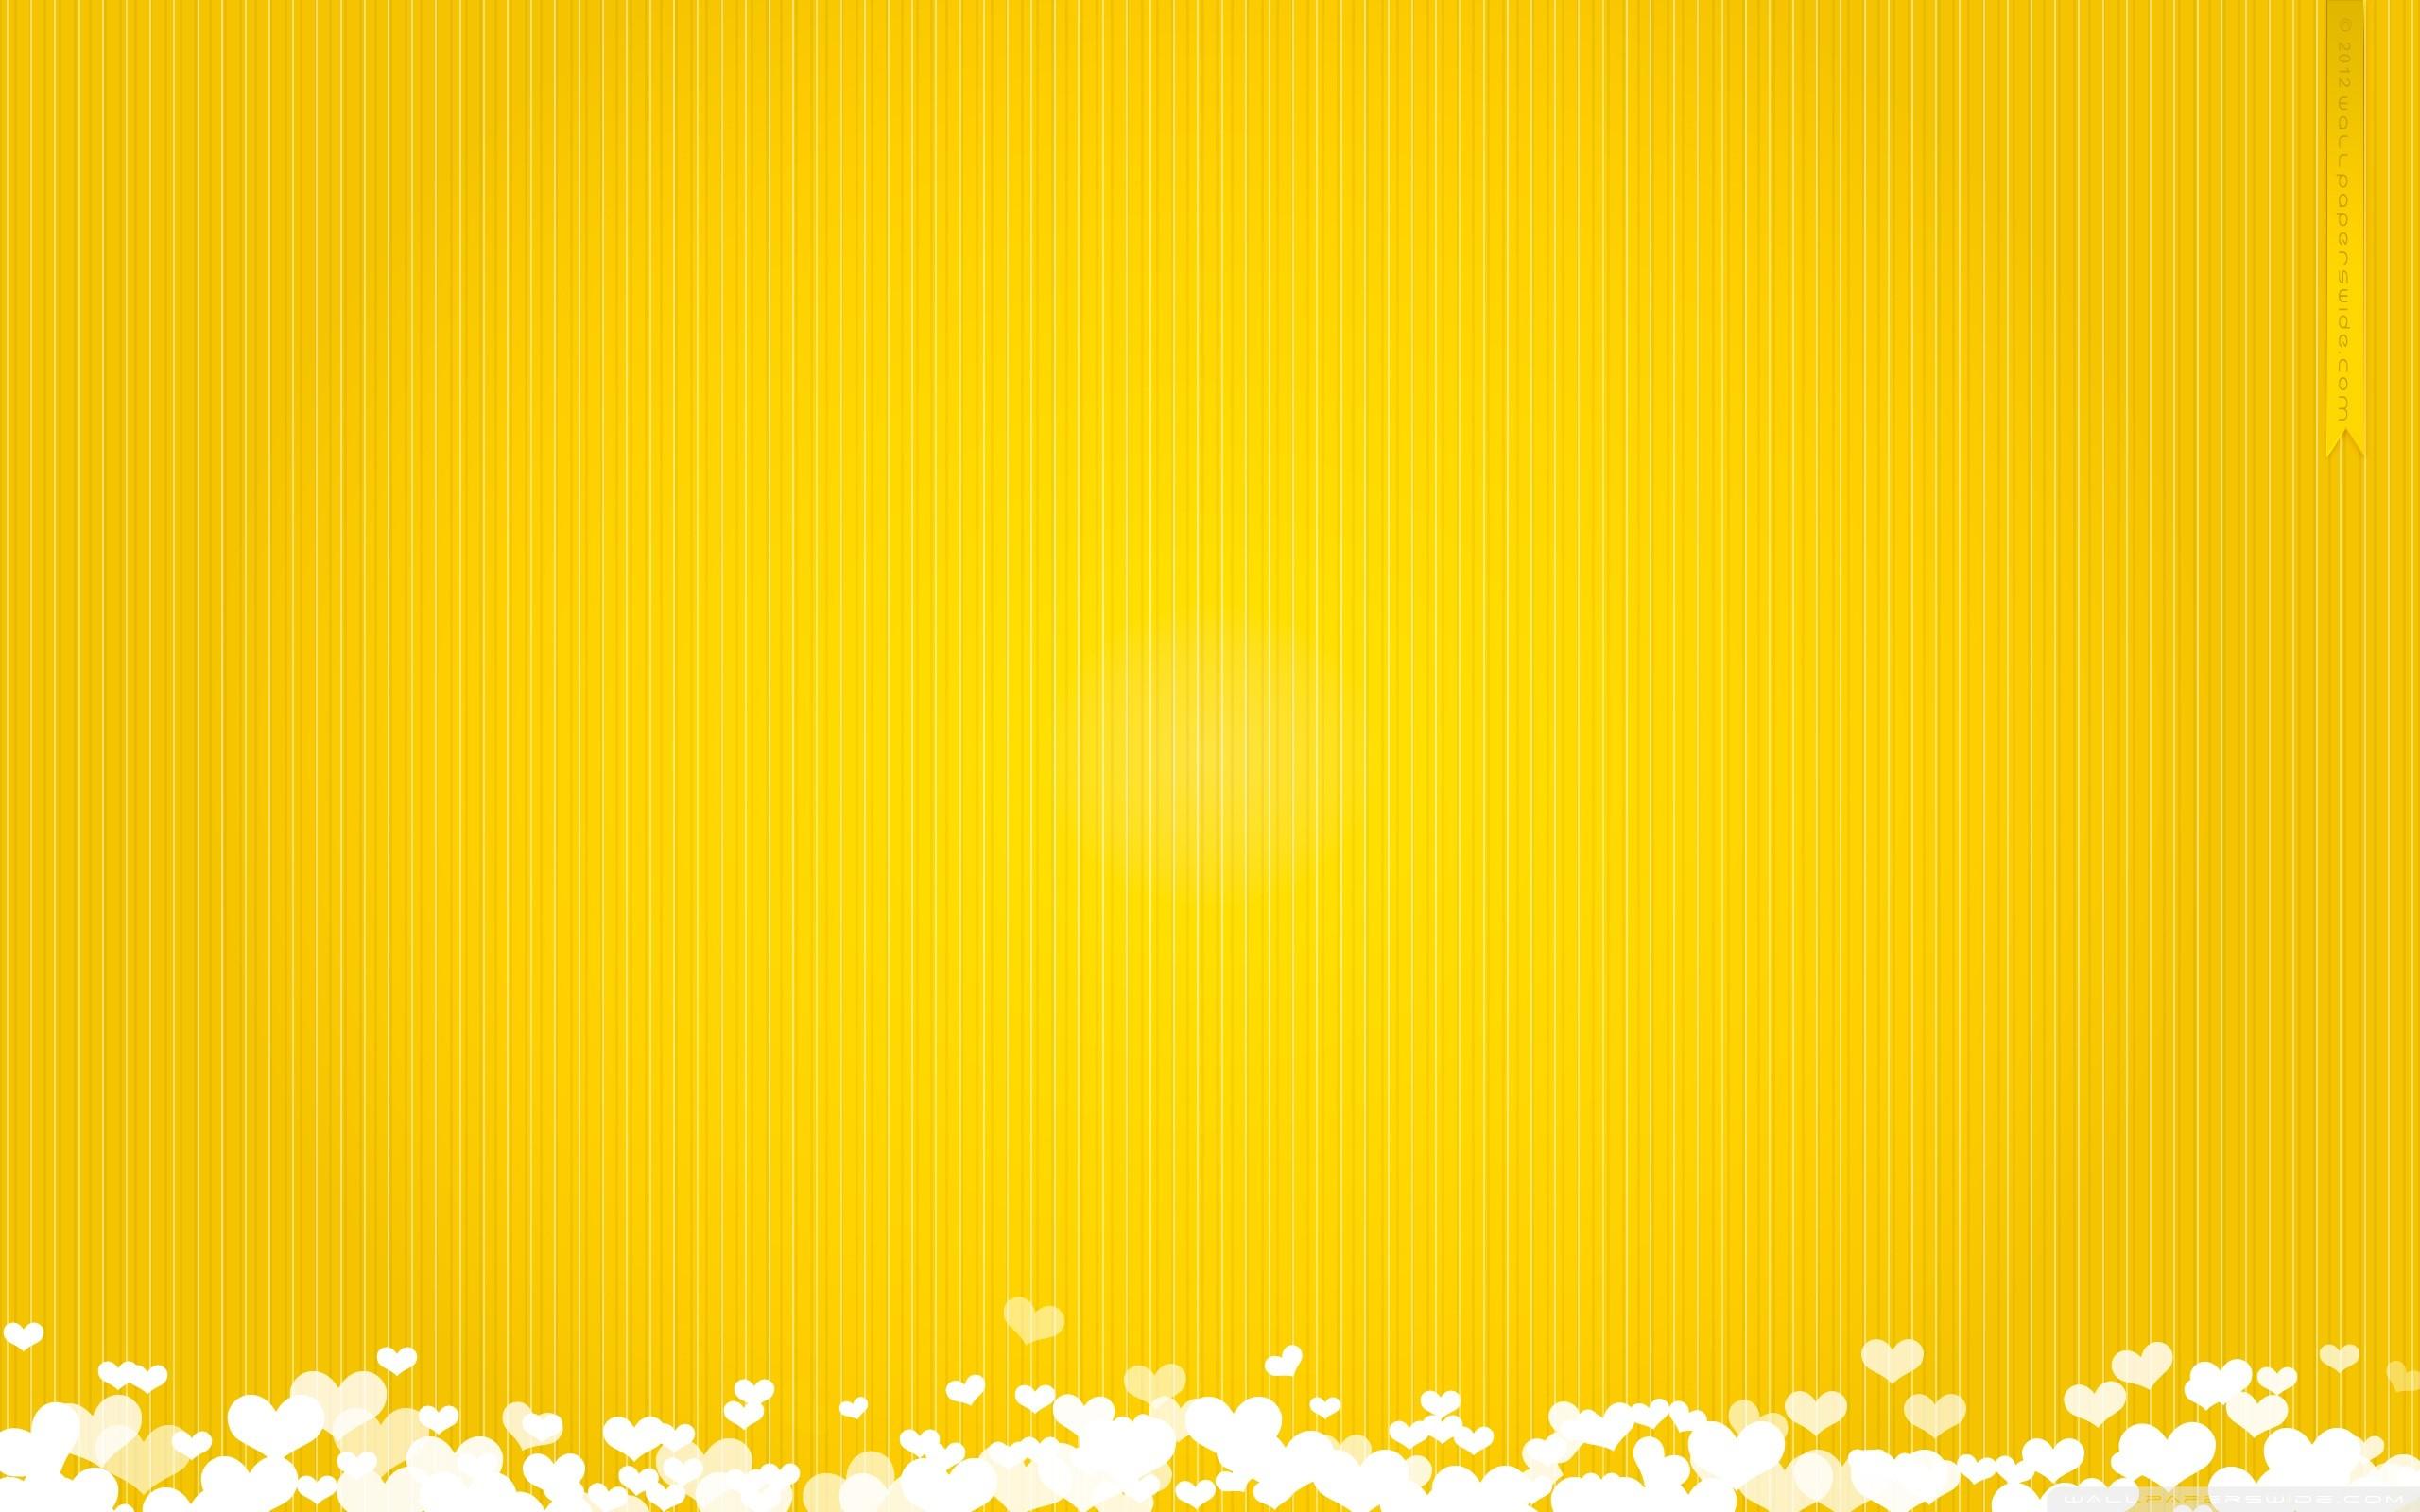 2560x1600 Yellow Wallpaper Abstract Hd